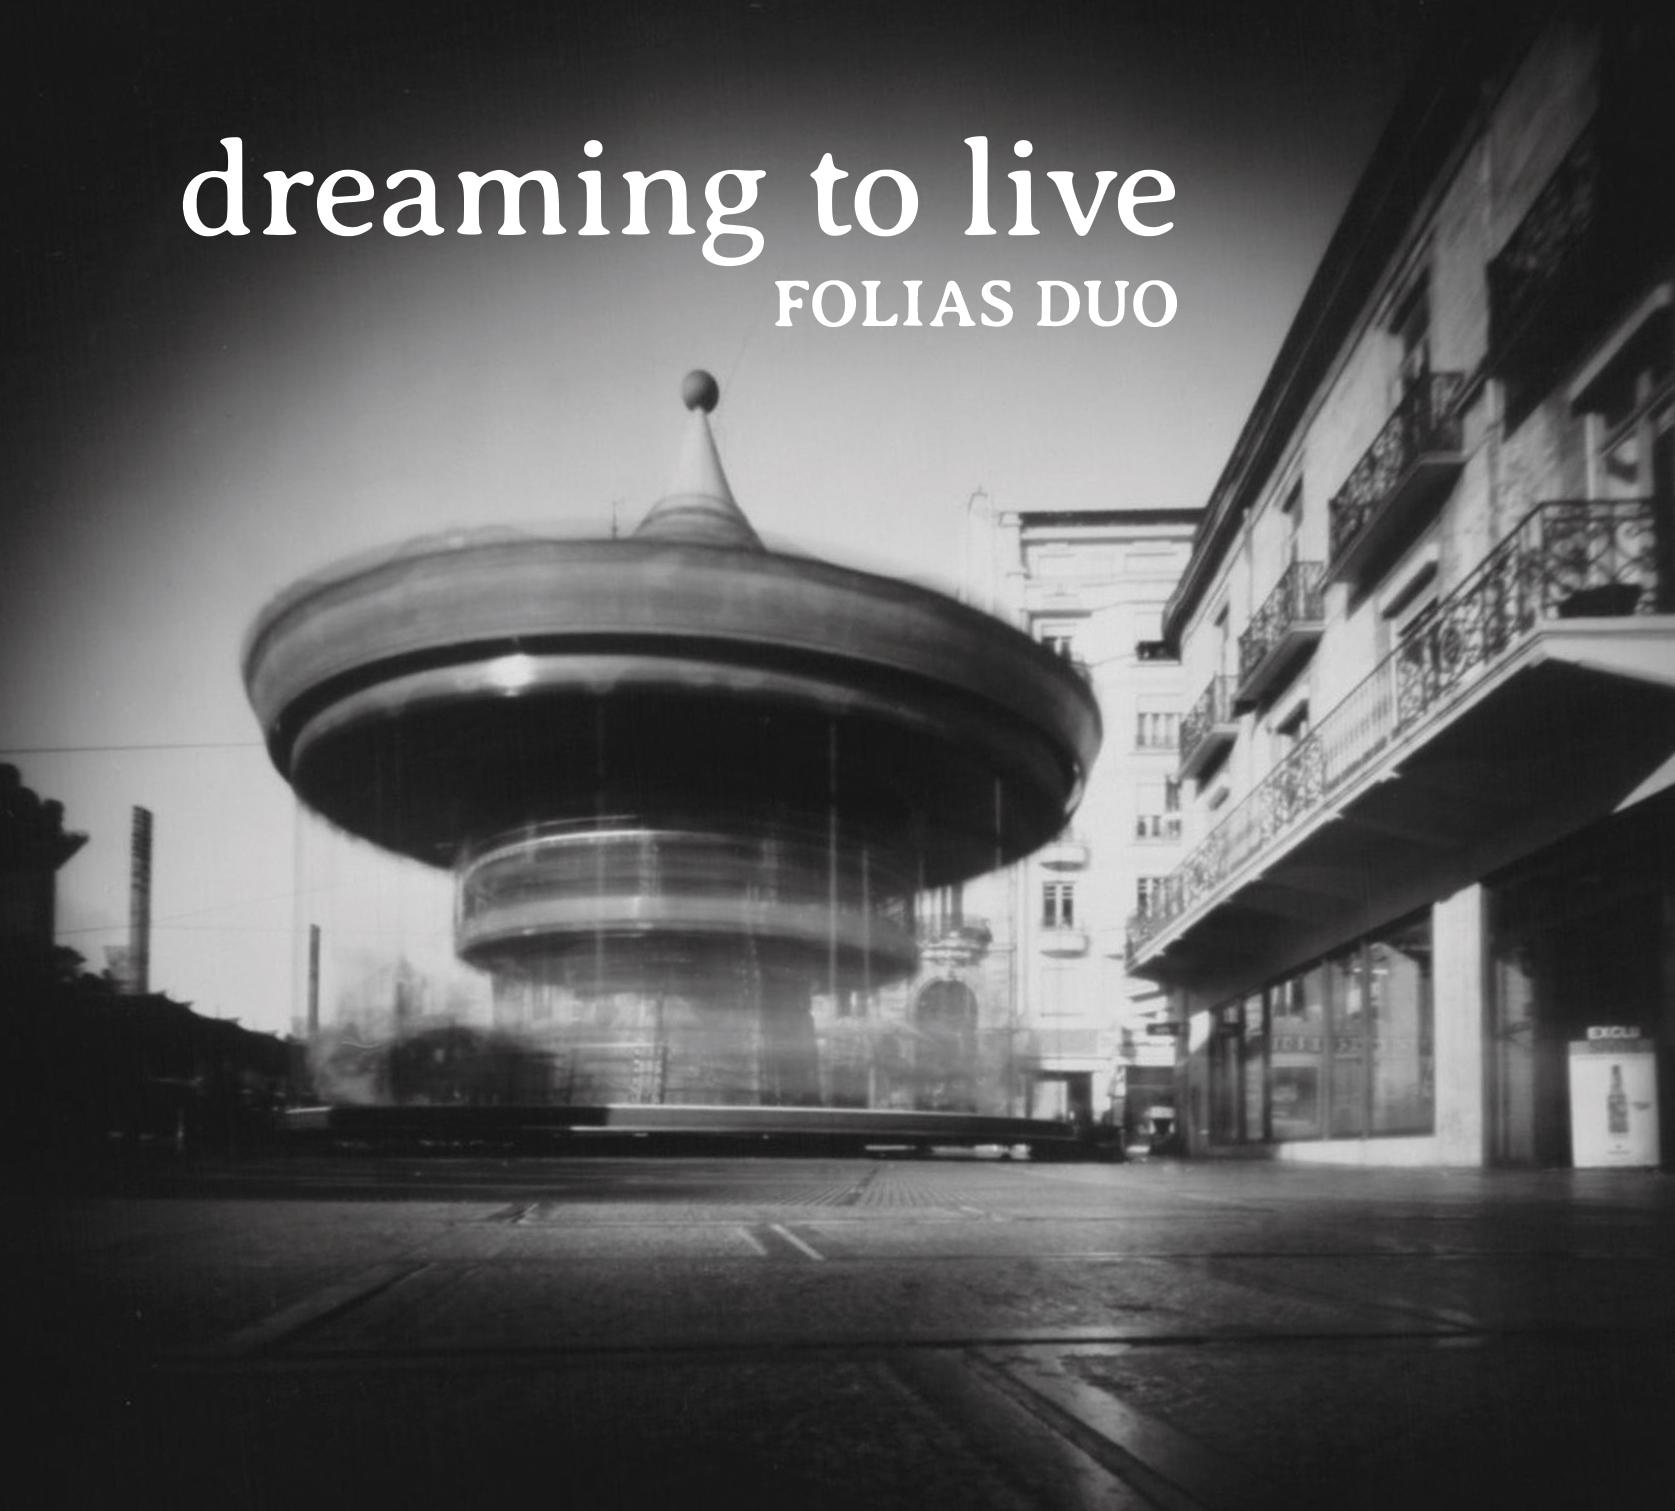 Dreaming to Live Tour Folias Duo